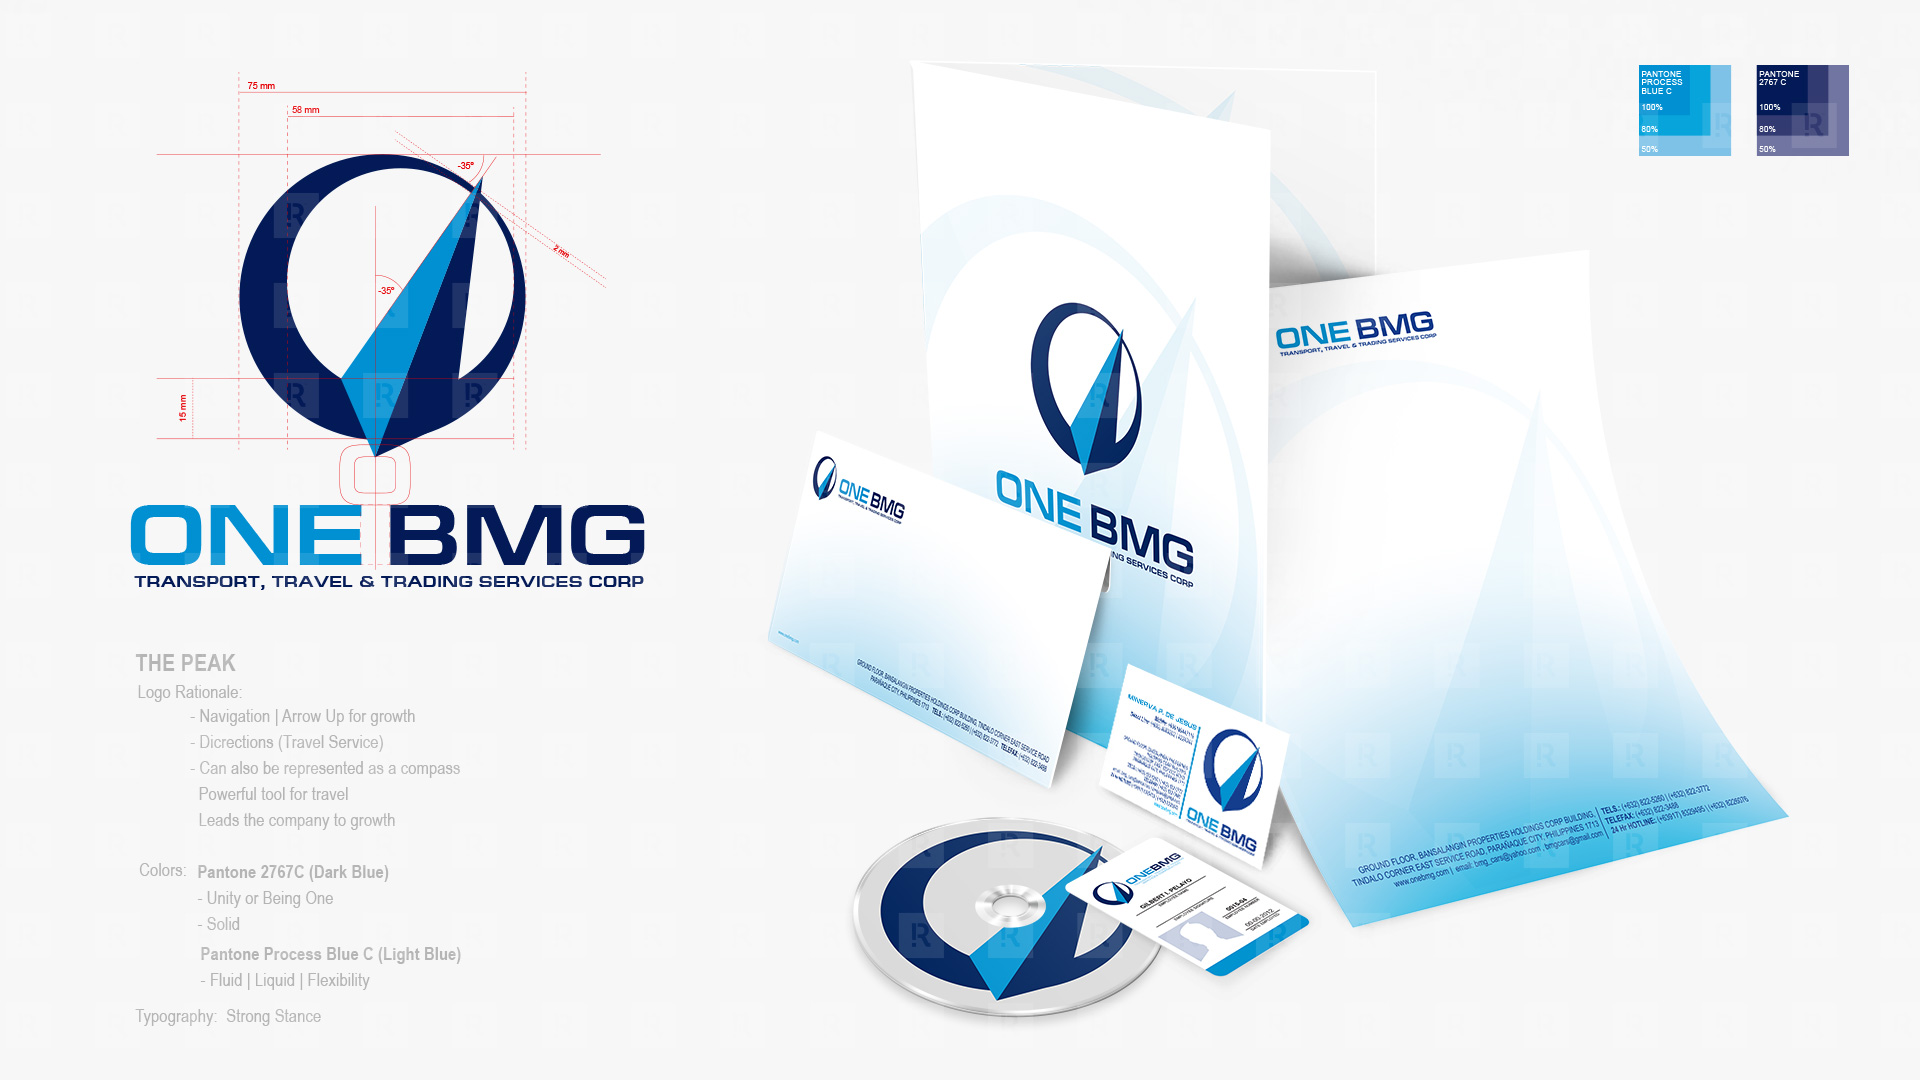 One BMG corporate Identity & Logo Standard